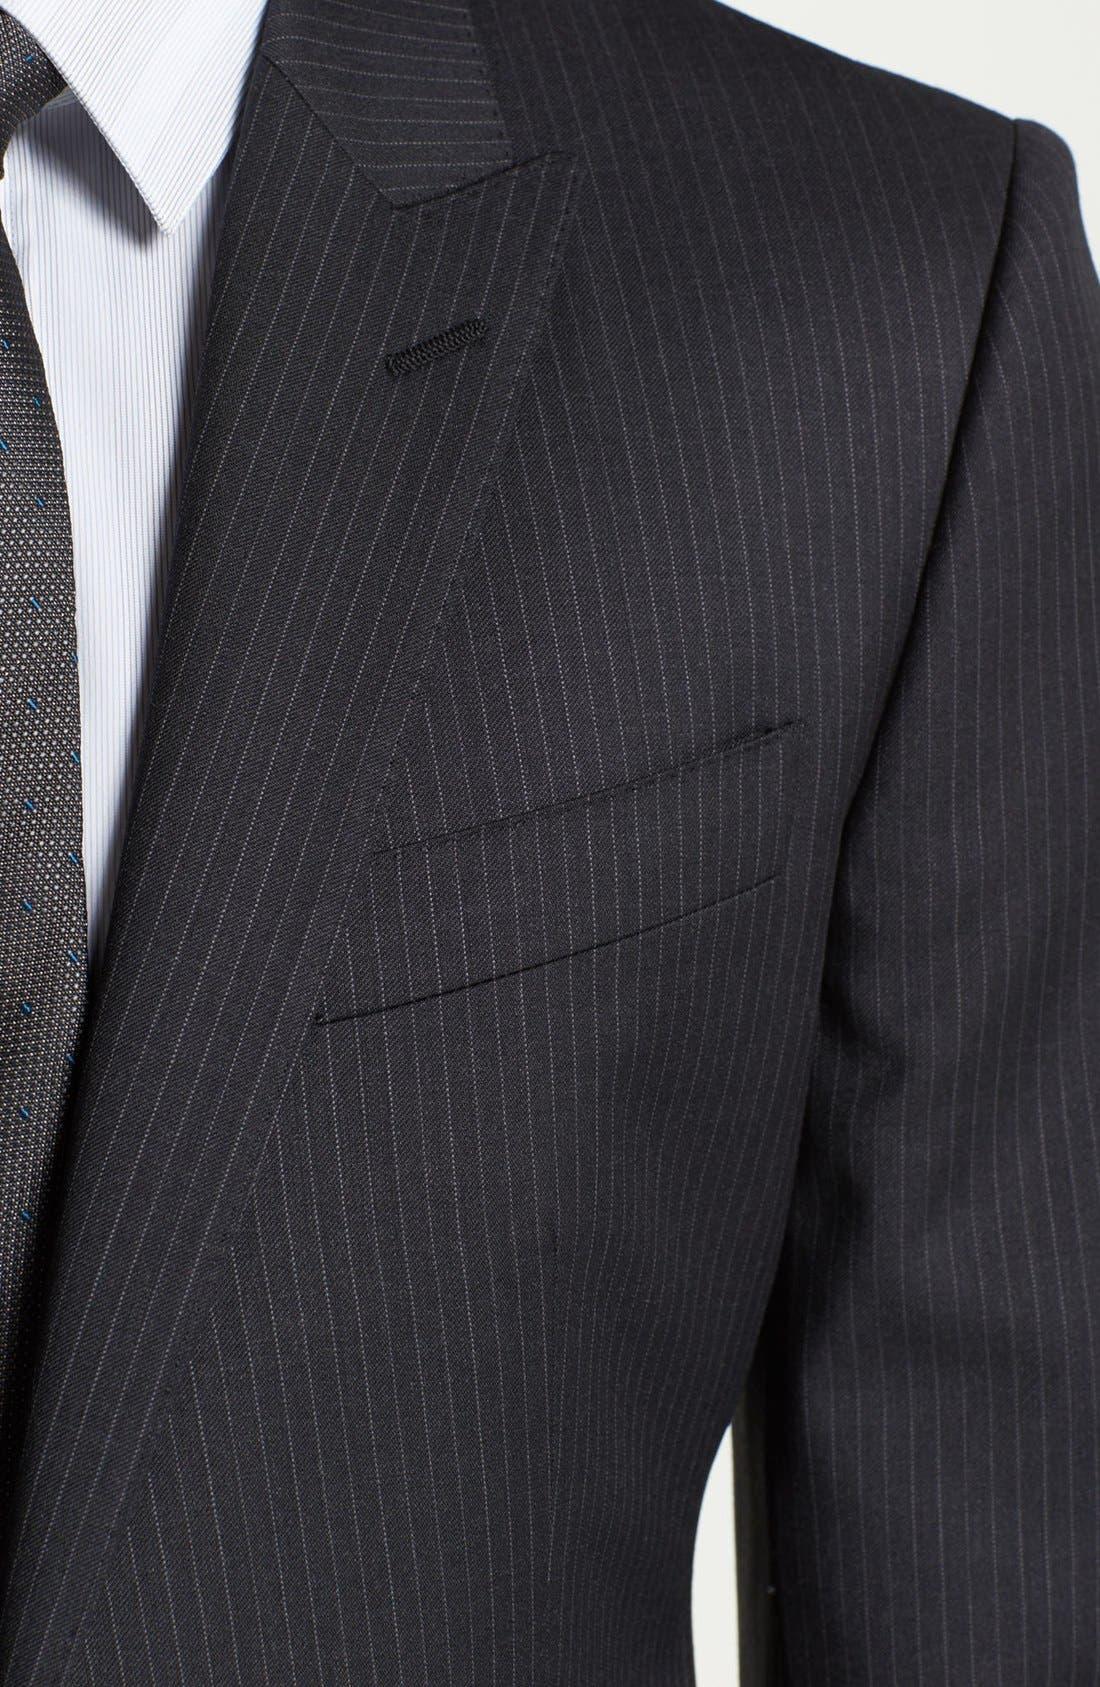 Alternate Image 2  - Dolce&Gabbana 'Martini' Pinstripe Wool Suit